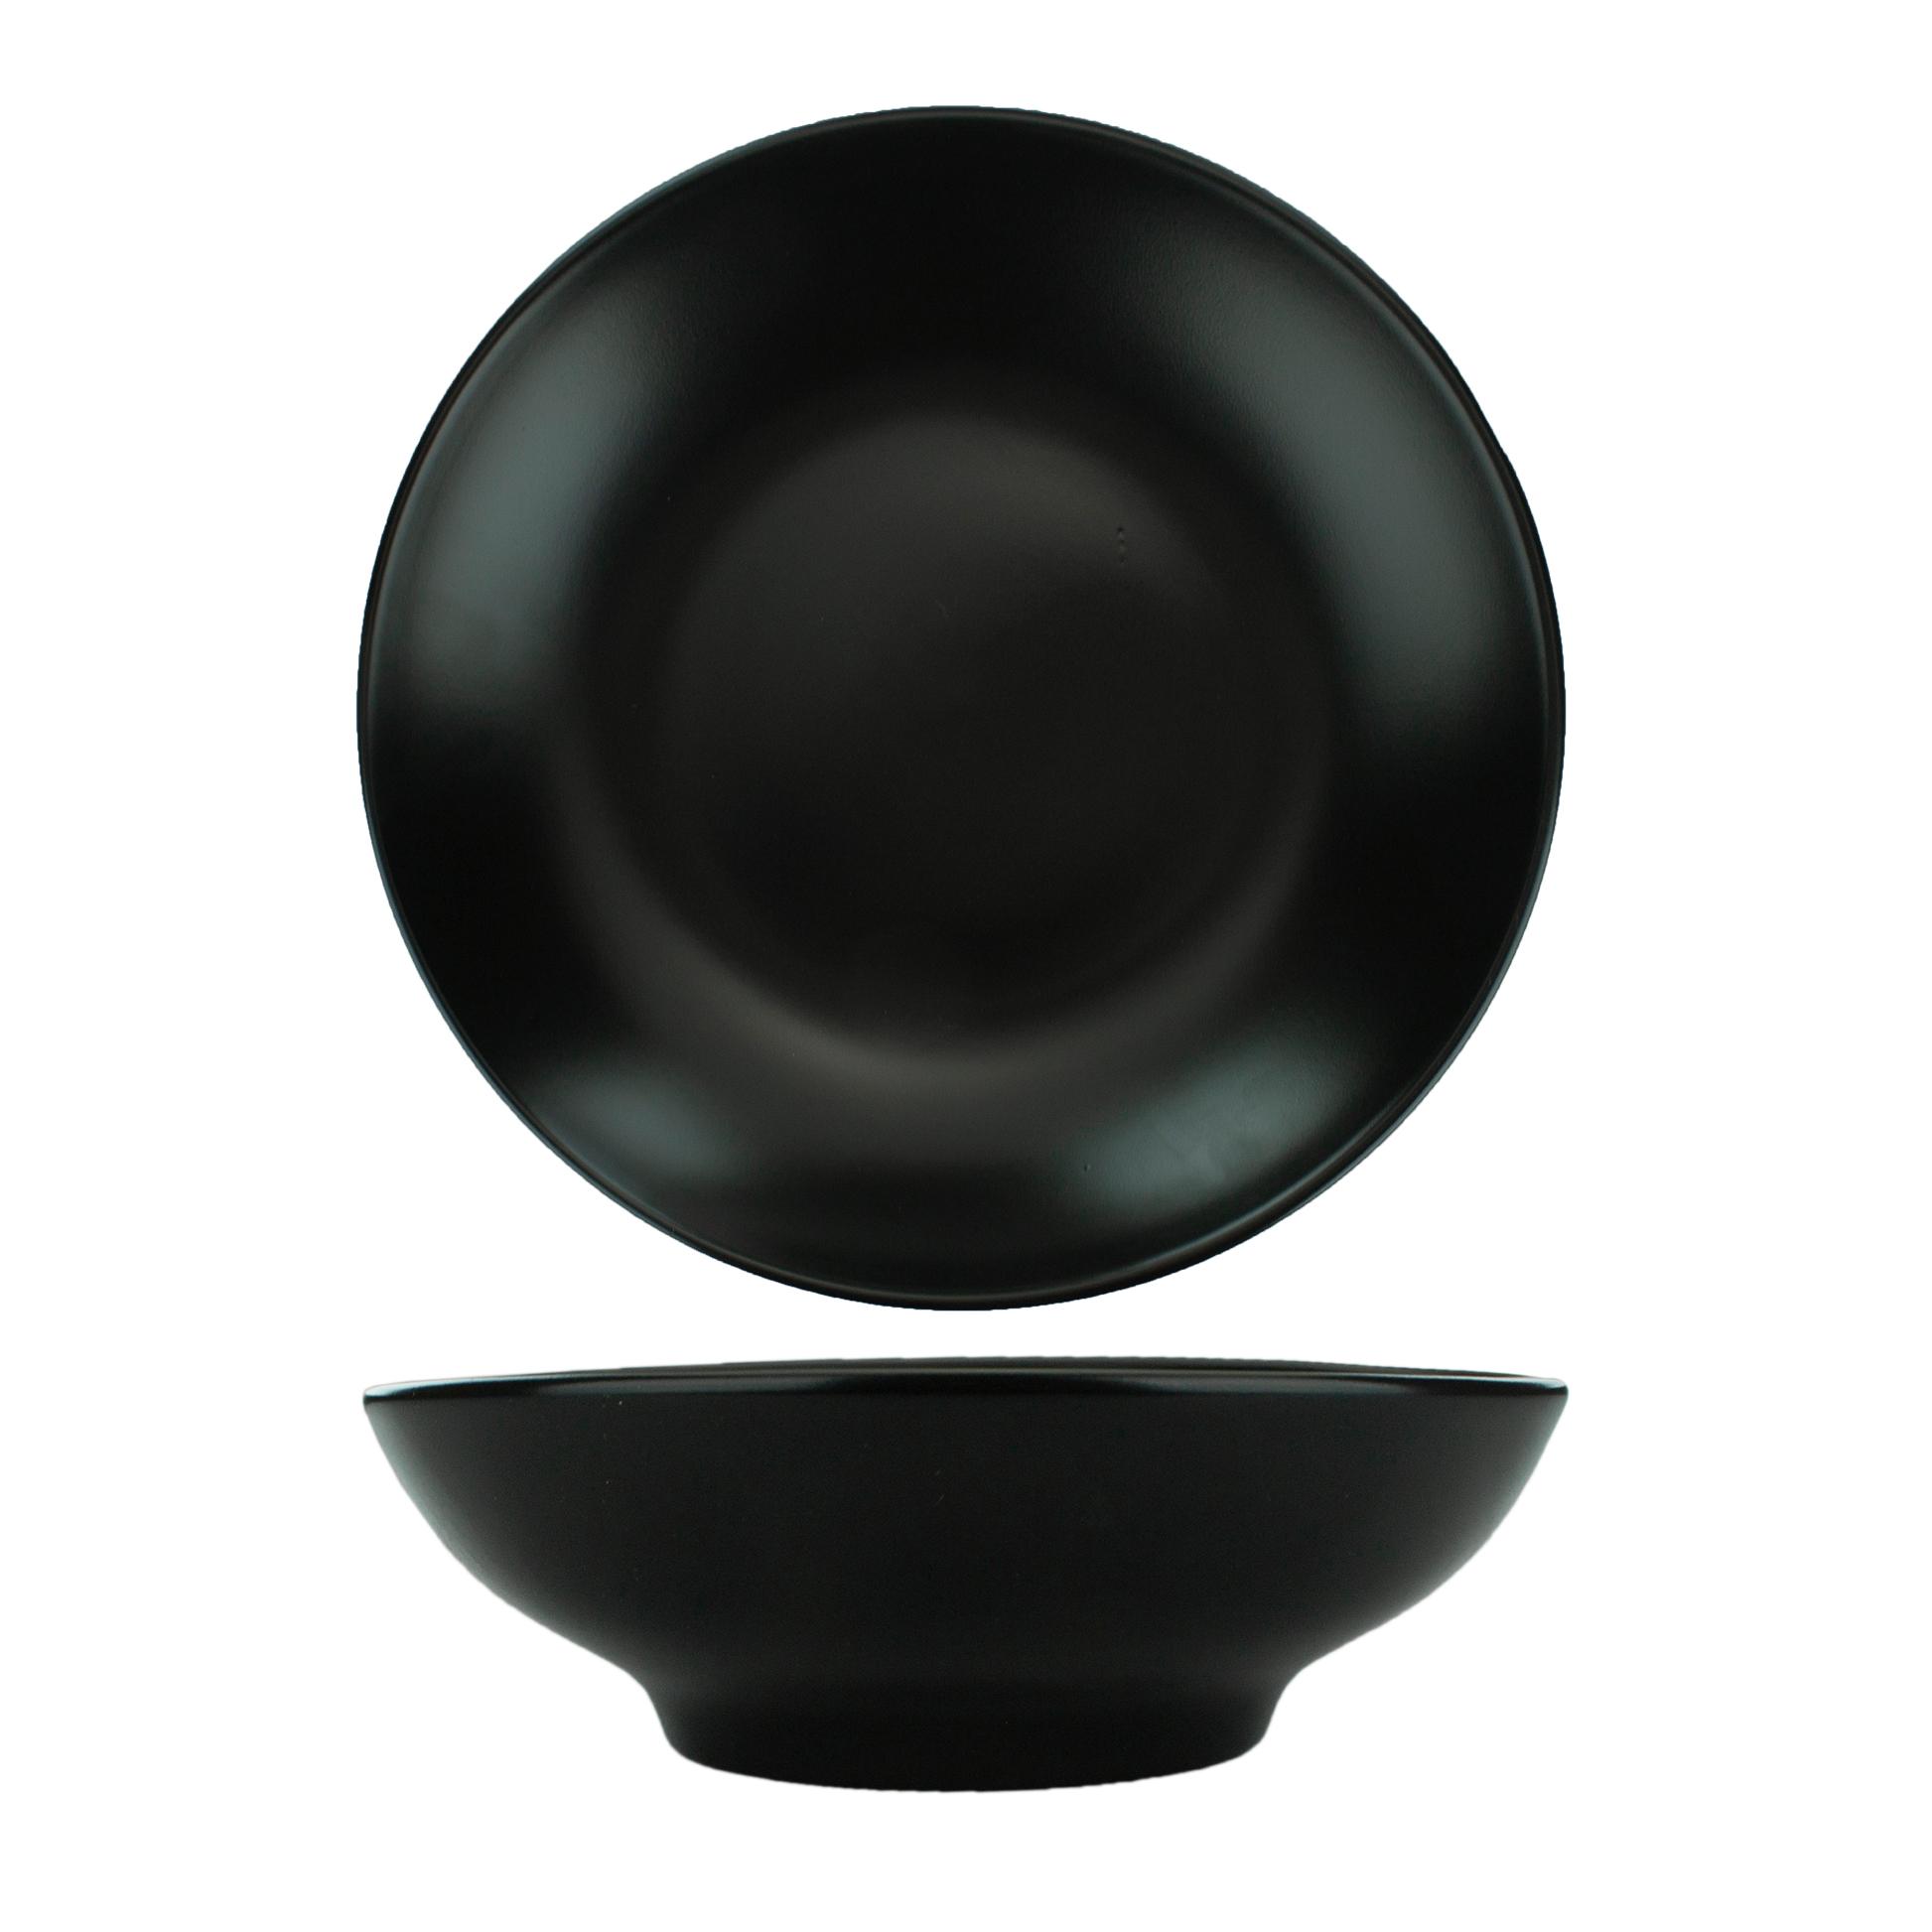 International Tableware TN-207-MB china, bowl, 17 - 32 oz